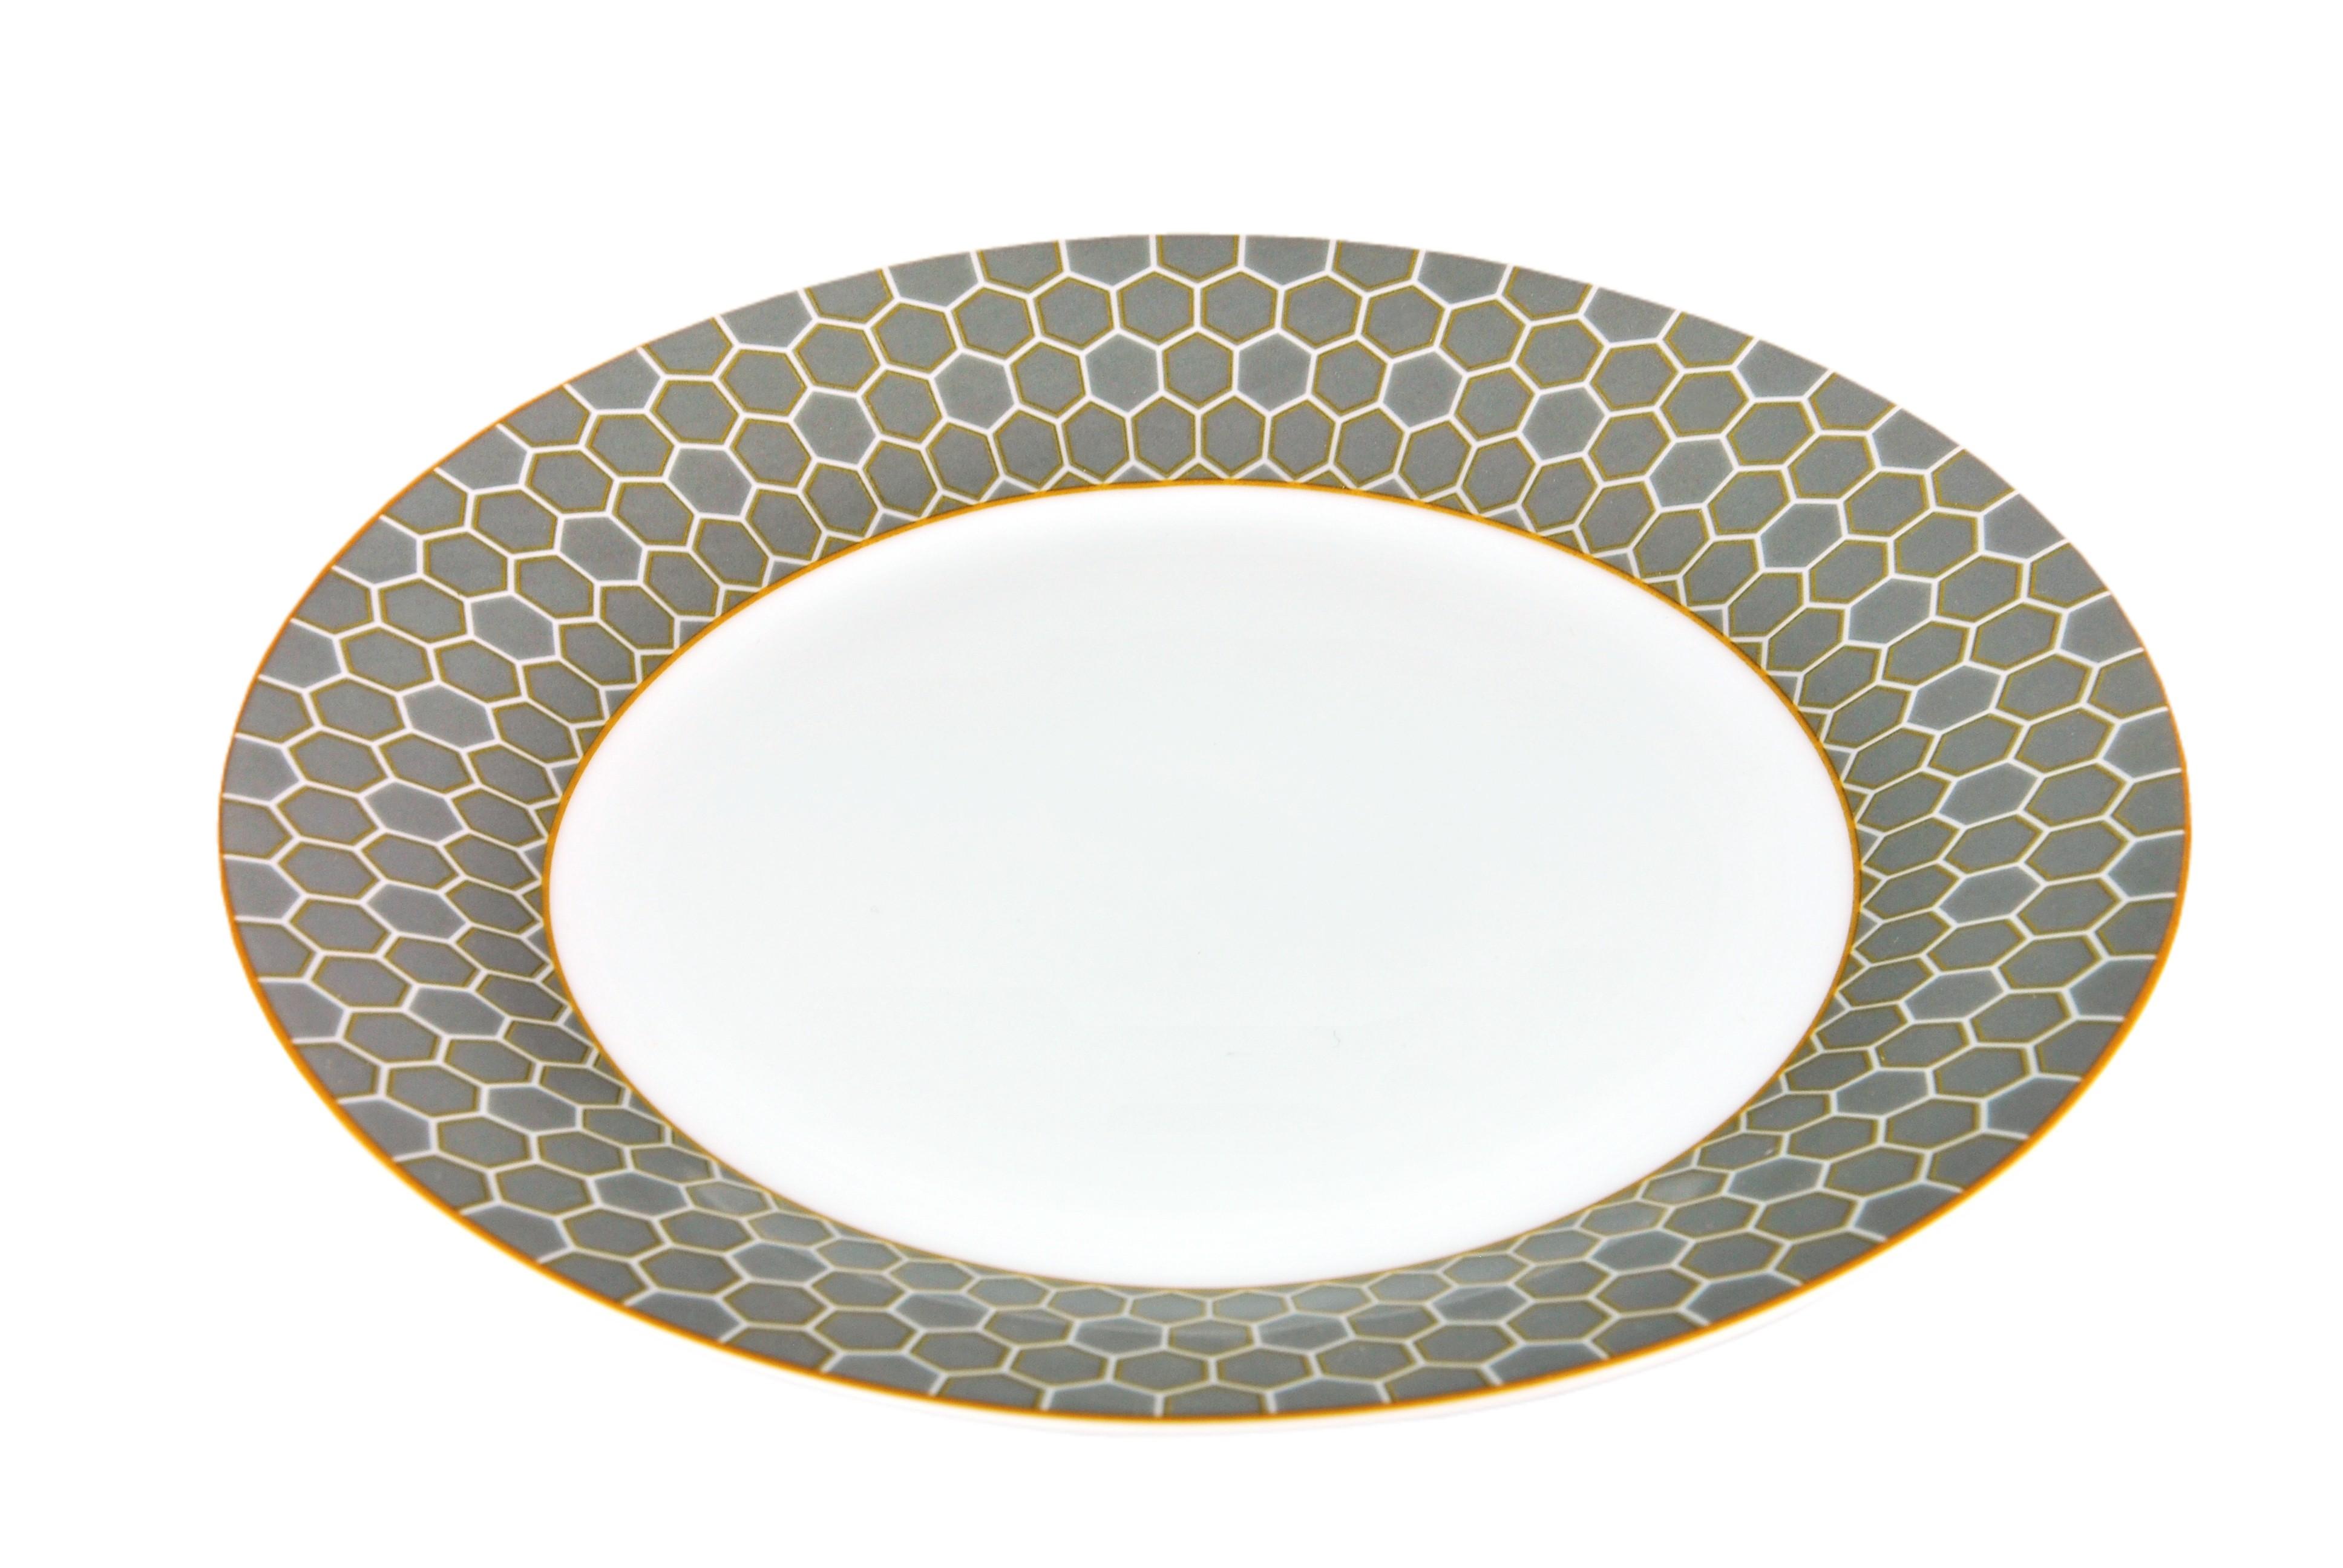 tafelservice honey 12tlg wei mit farbigem dekor f r 6 personen porzellan tafelservice mit dekor. Black Bedroom Furniture Sets. Home Design Ideas